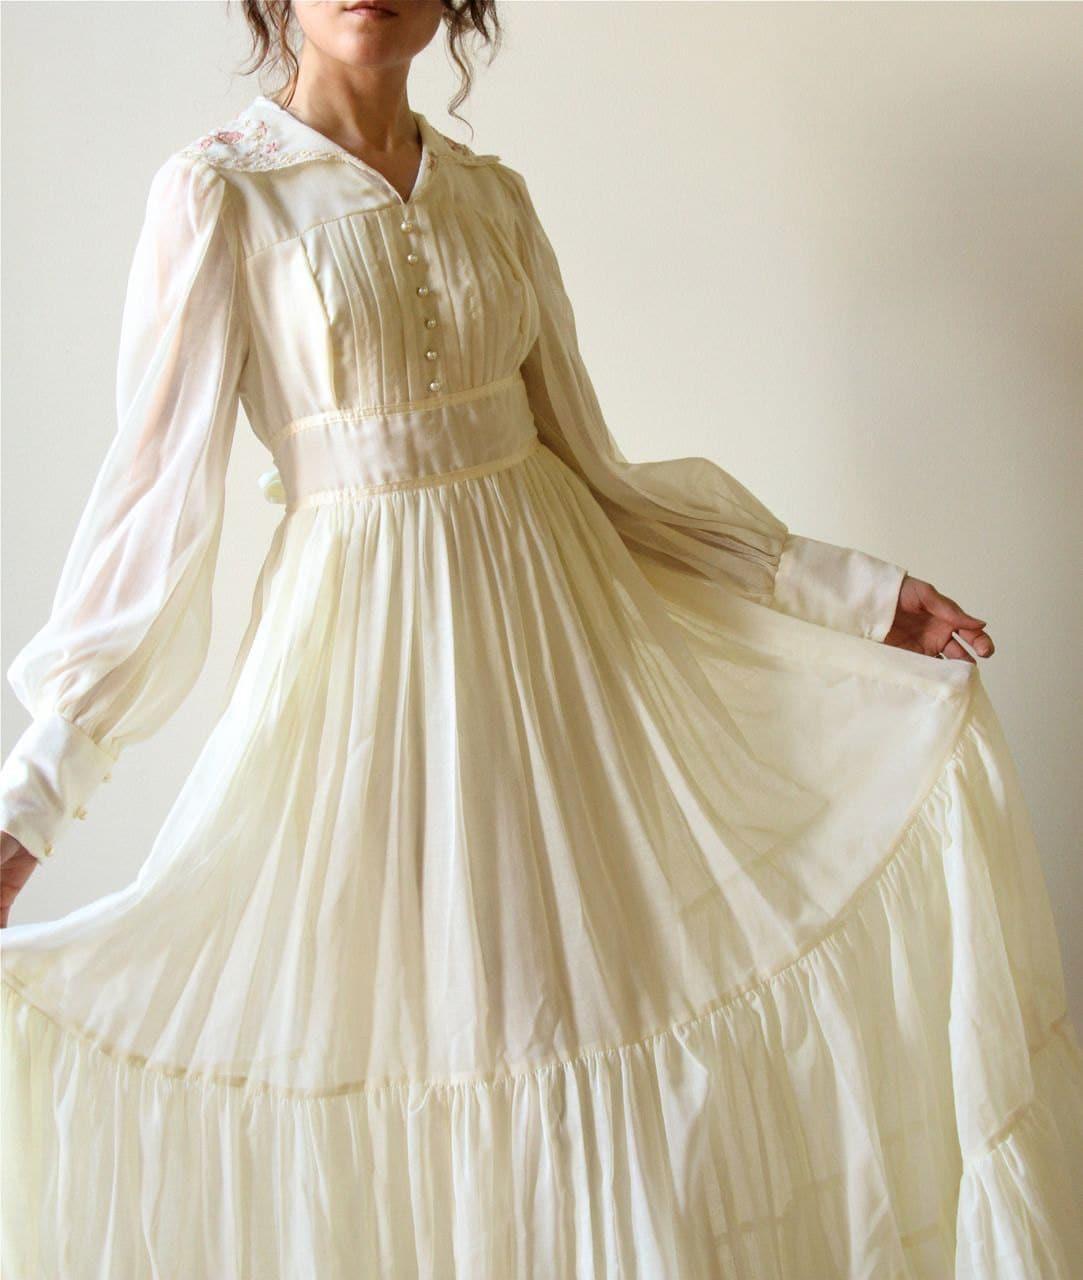 70s gunne sax boho wedding dress vintage ivory by for 70s inspired wedding dress